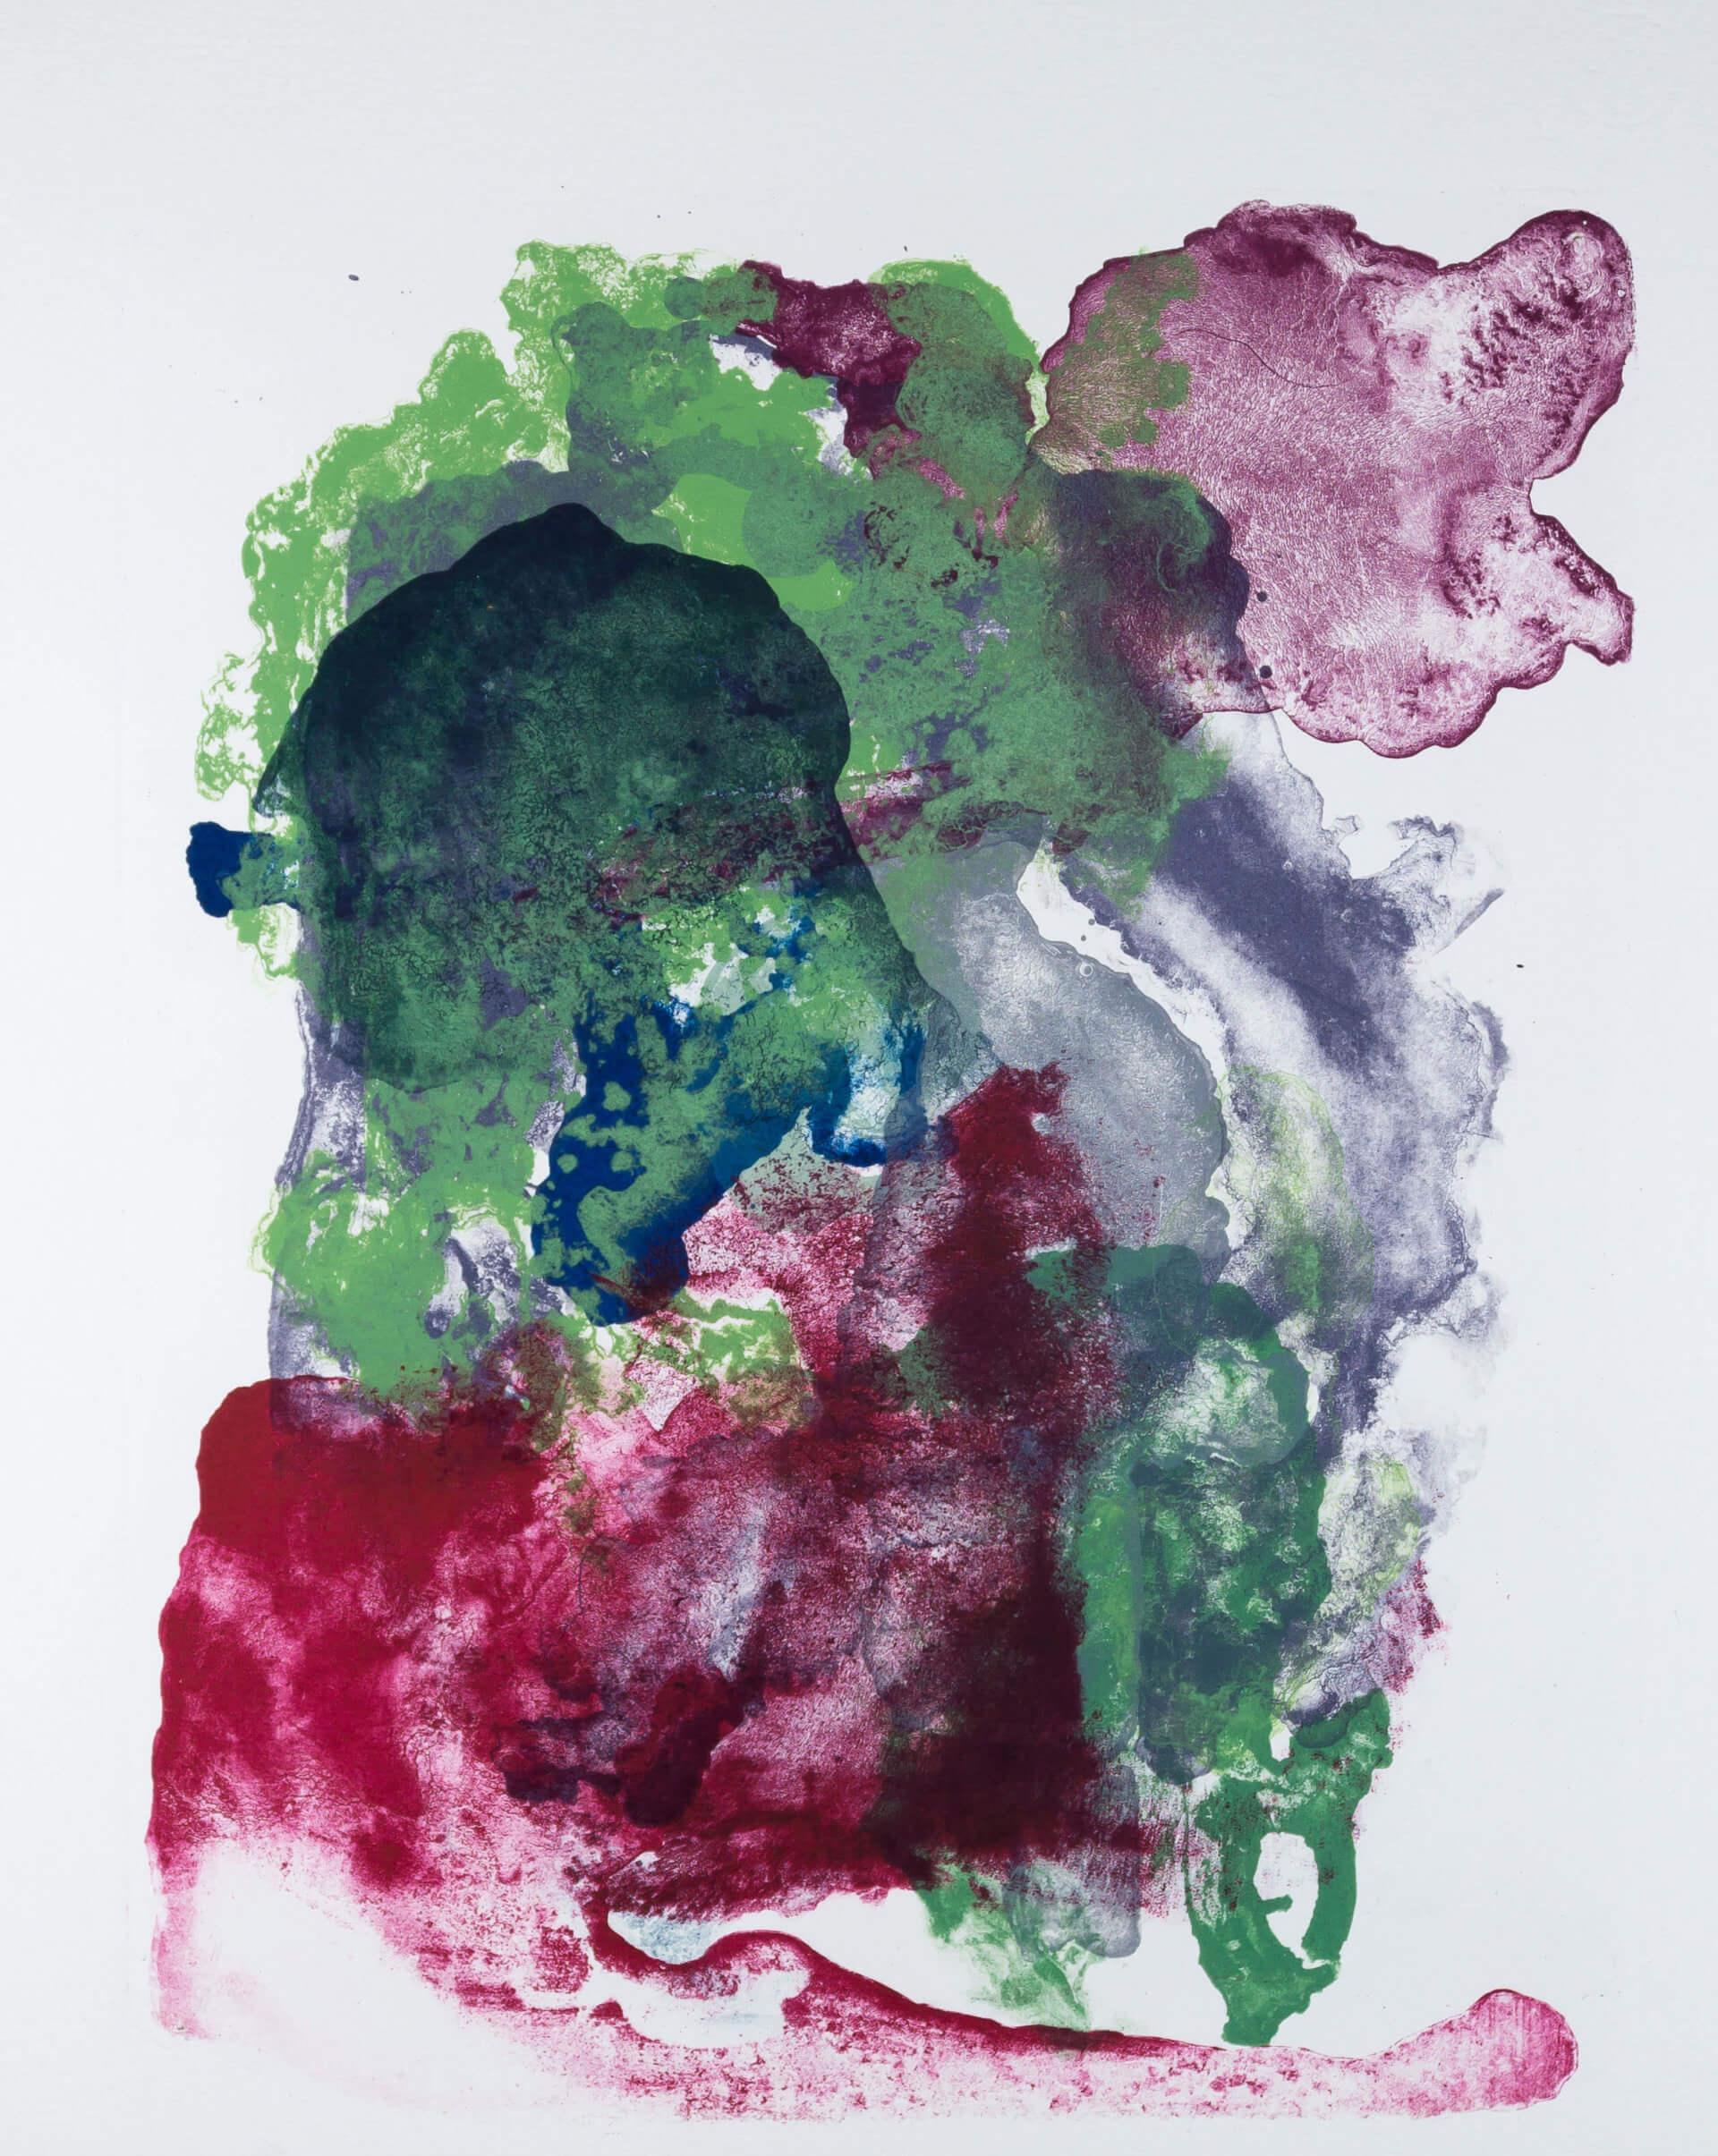 Katharina Albers, organism (growing)(I), 2017, Farblithographie, Unikat, 56x45 cm